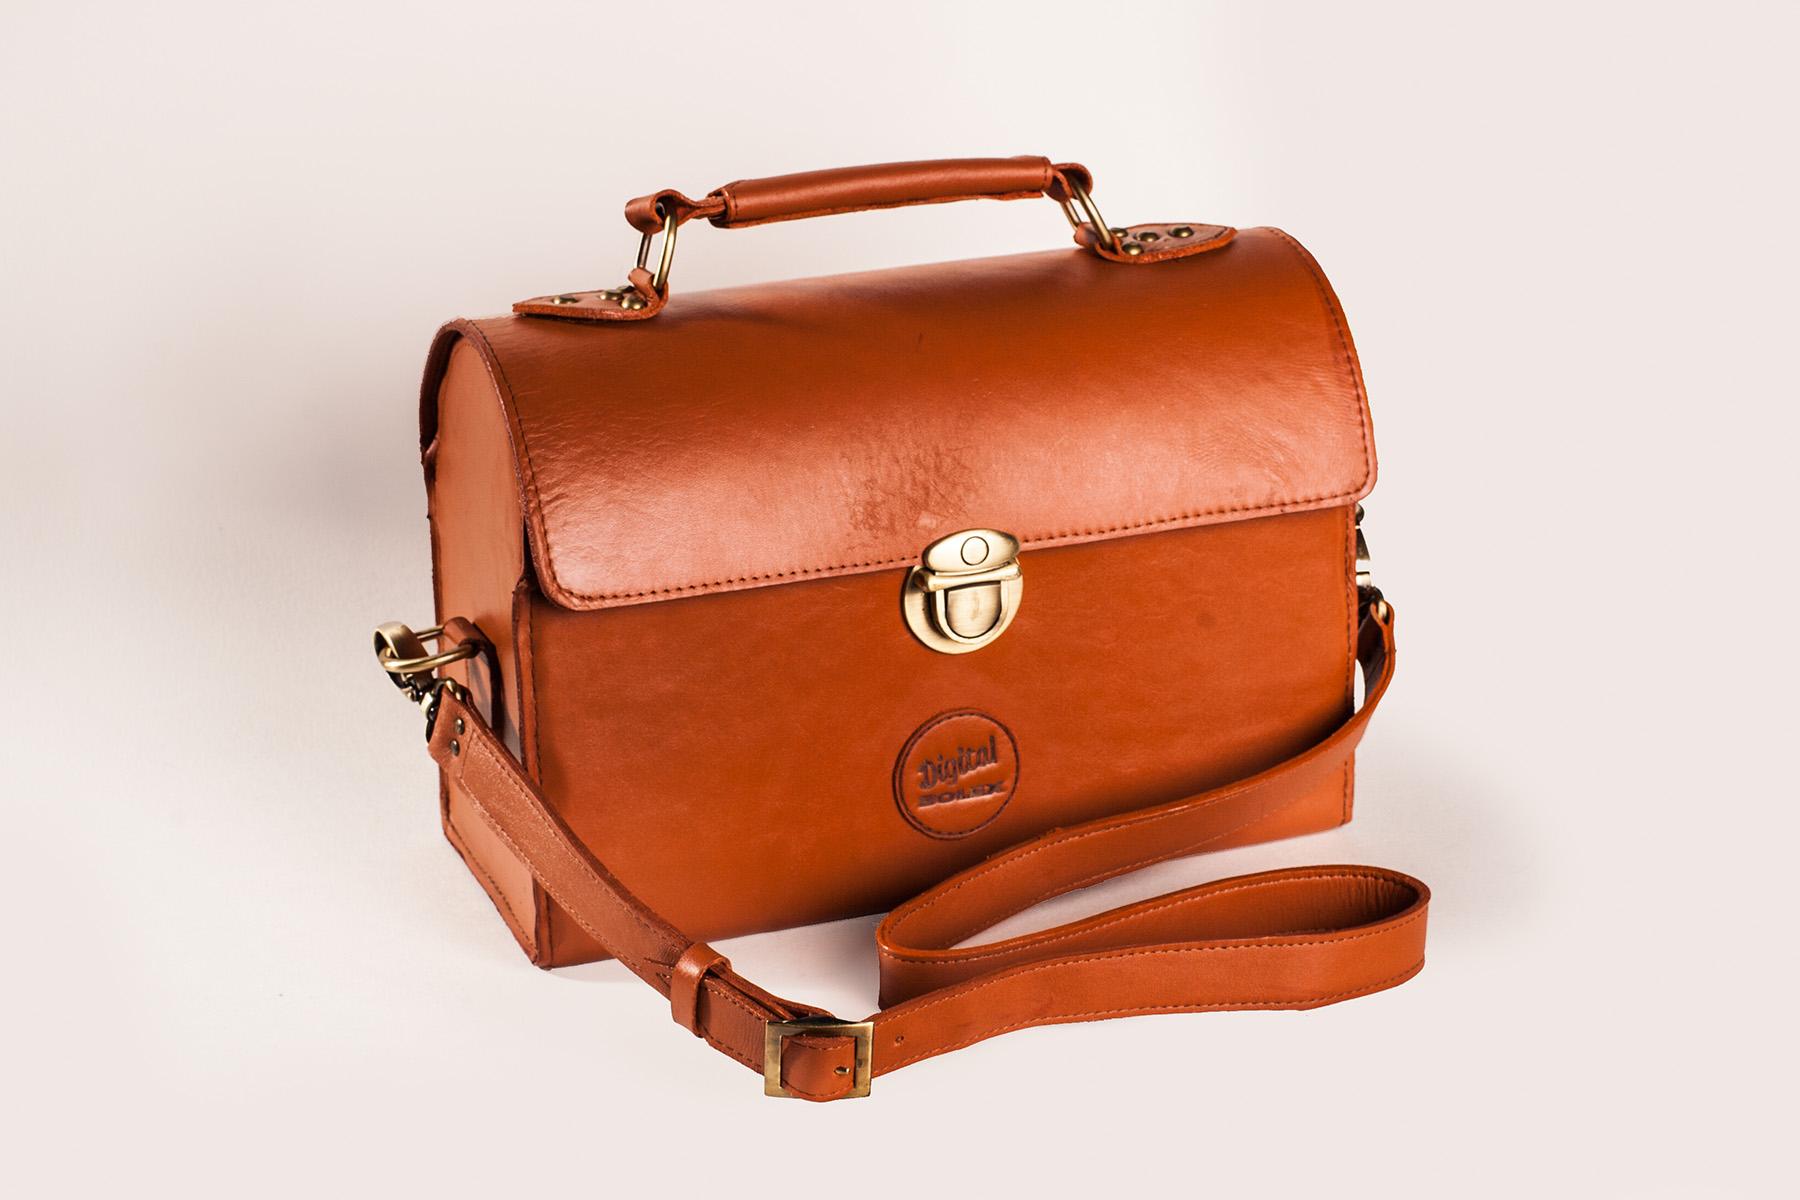 Custom D16 Bag Update | DigitalBolex.com